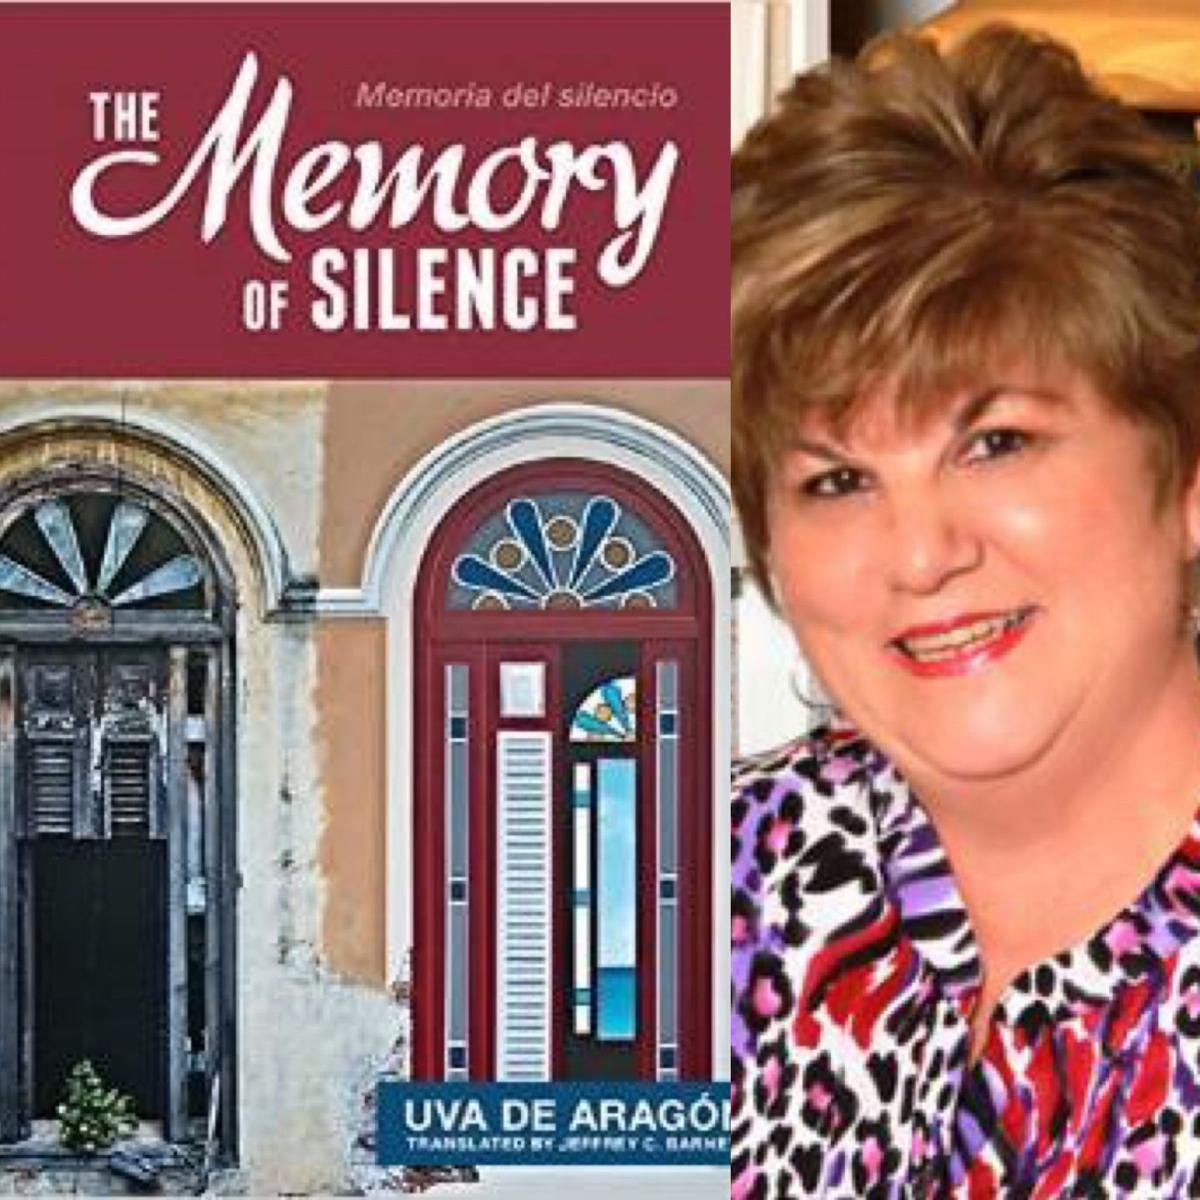 Uva de Aragon - Memory of Silence